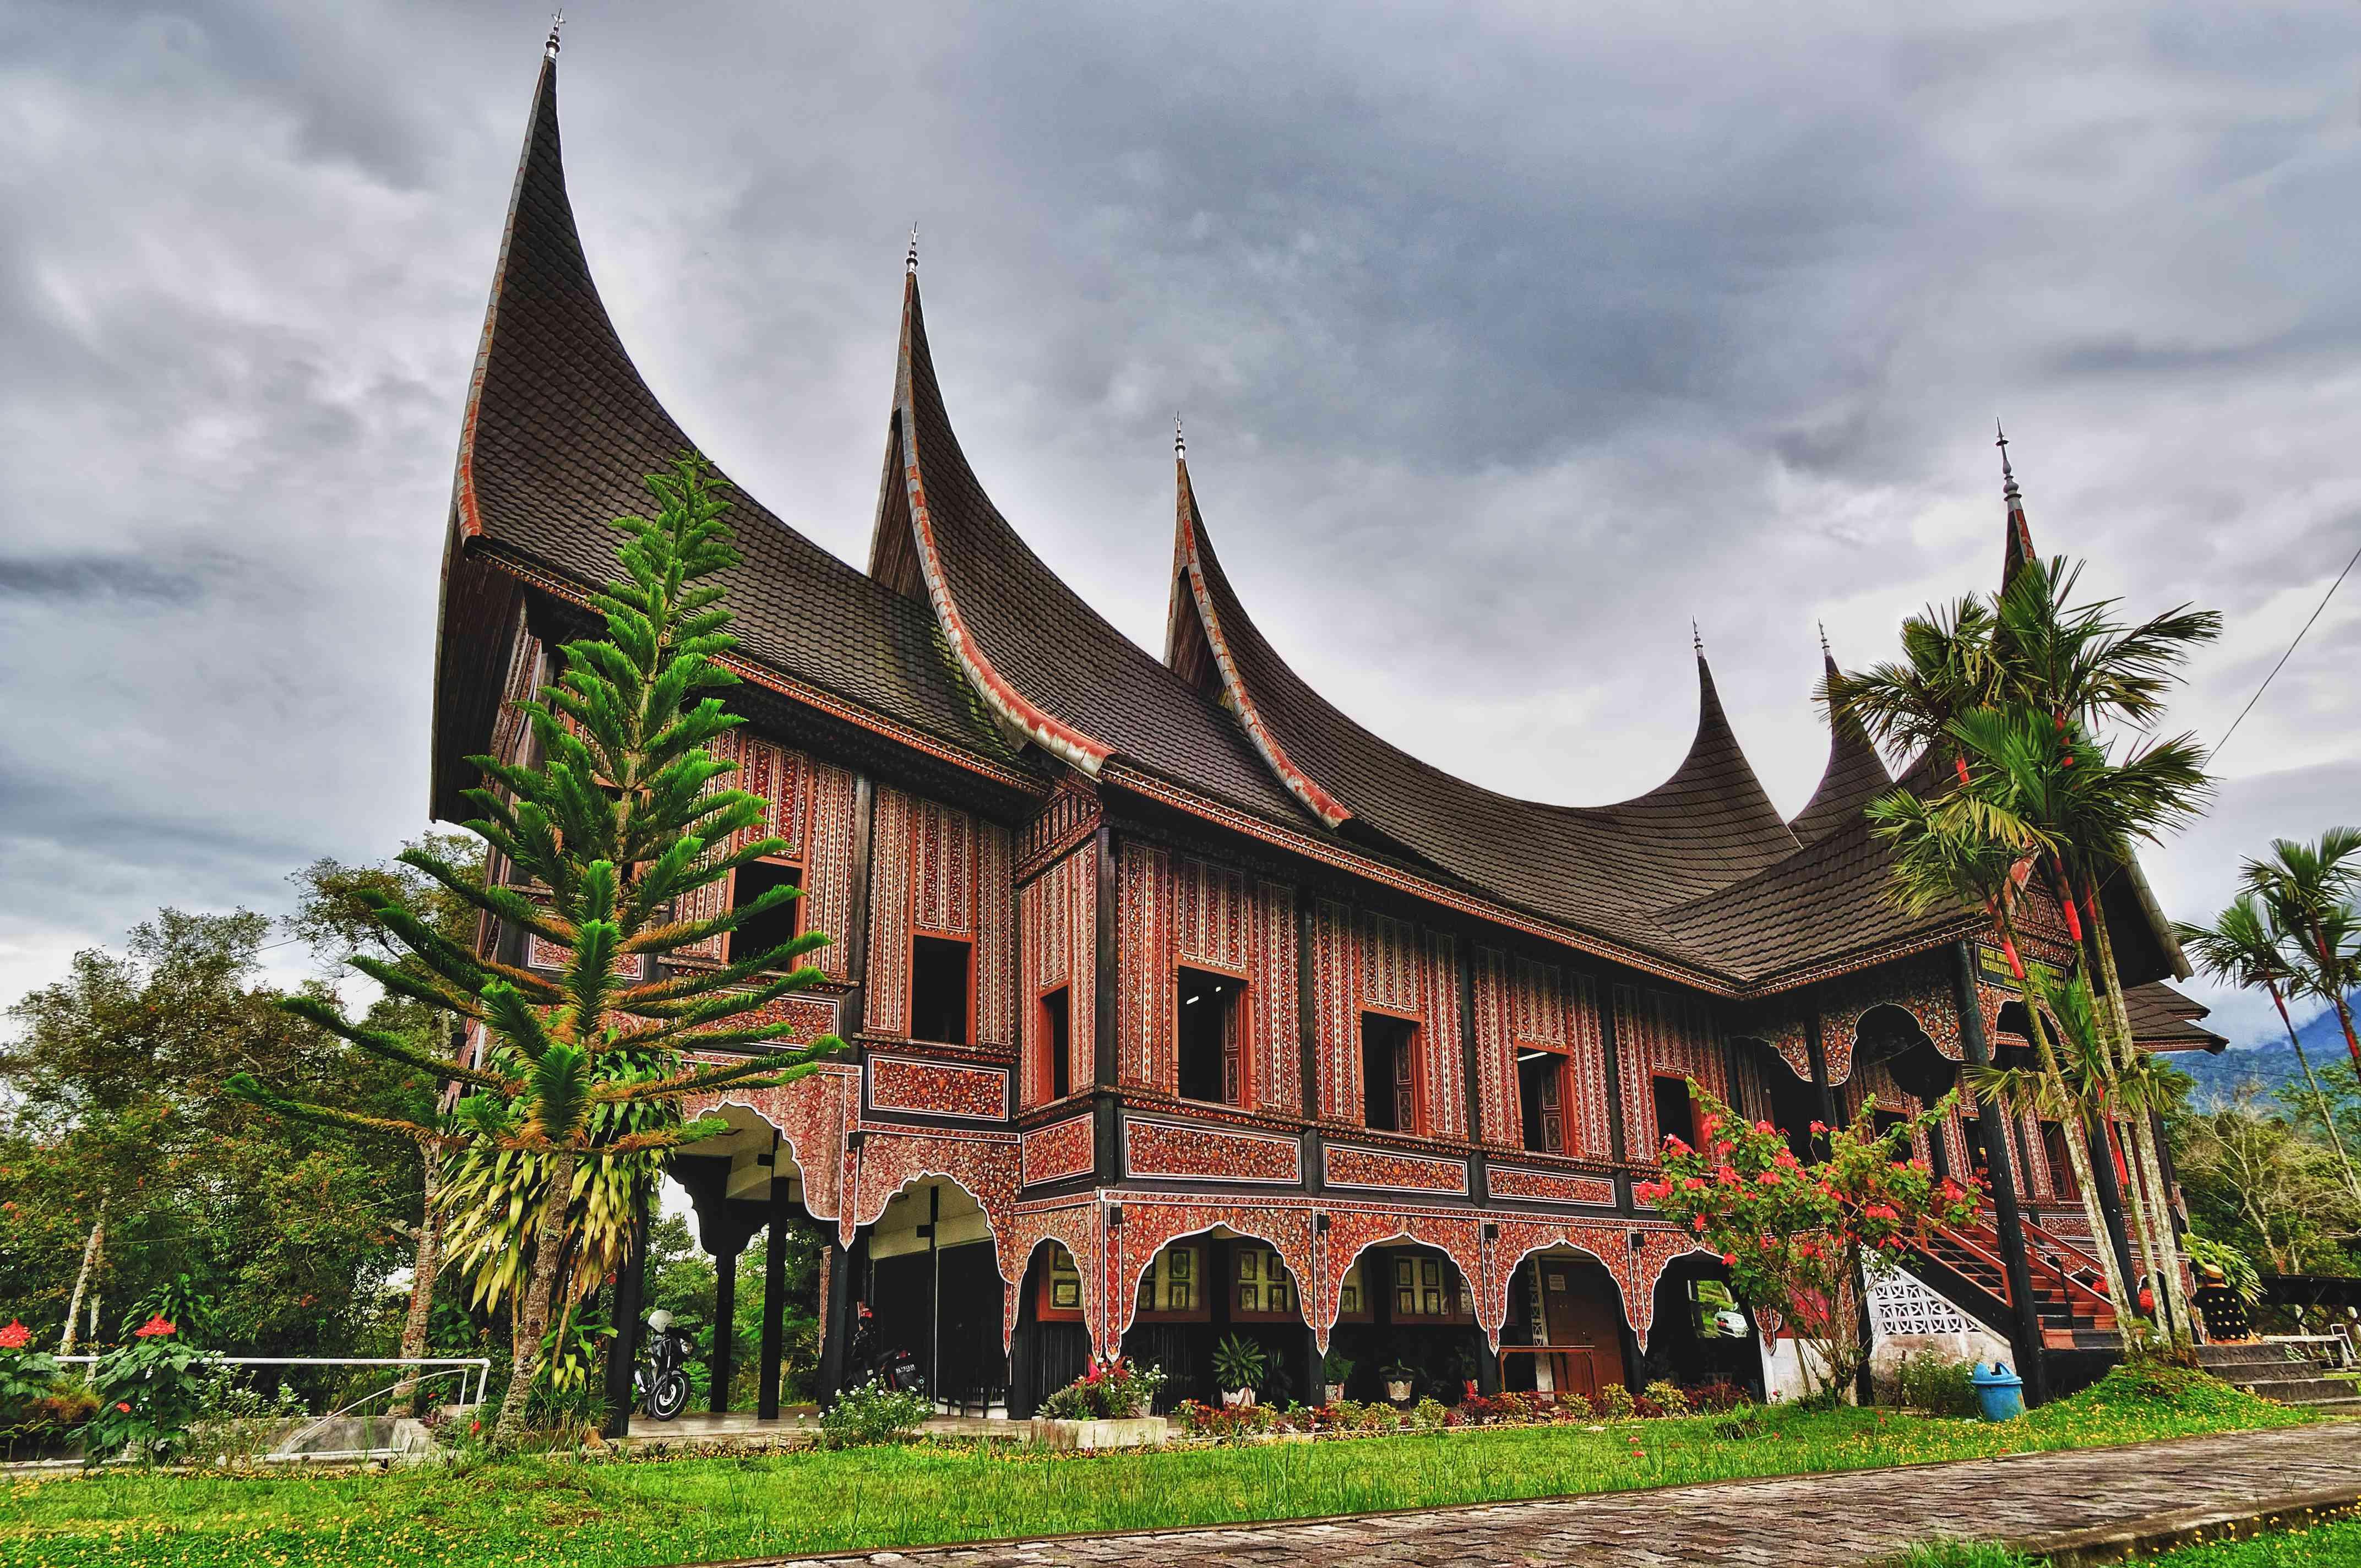 Traditional house in Padang, Sumatra